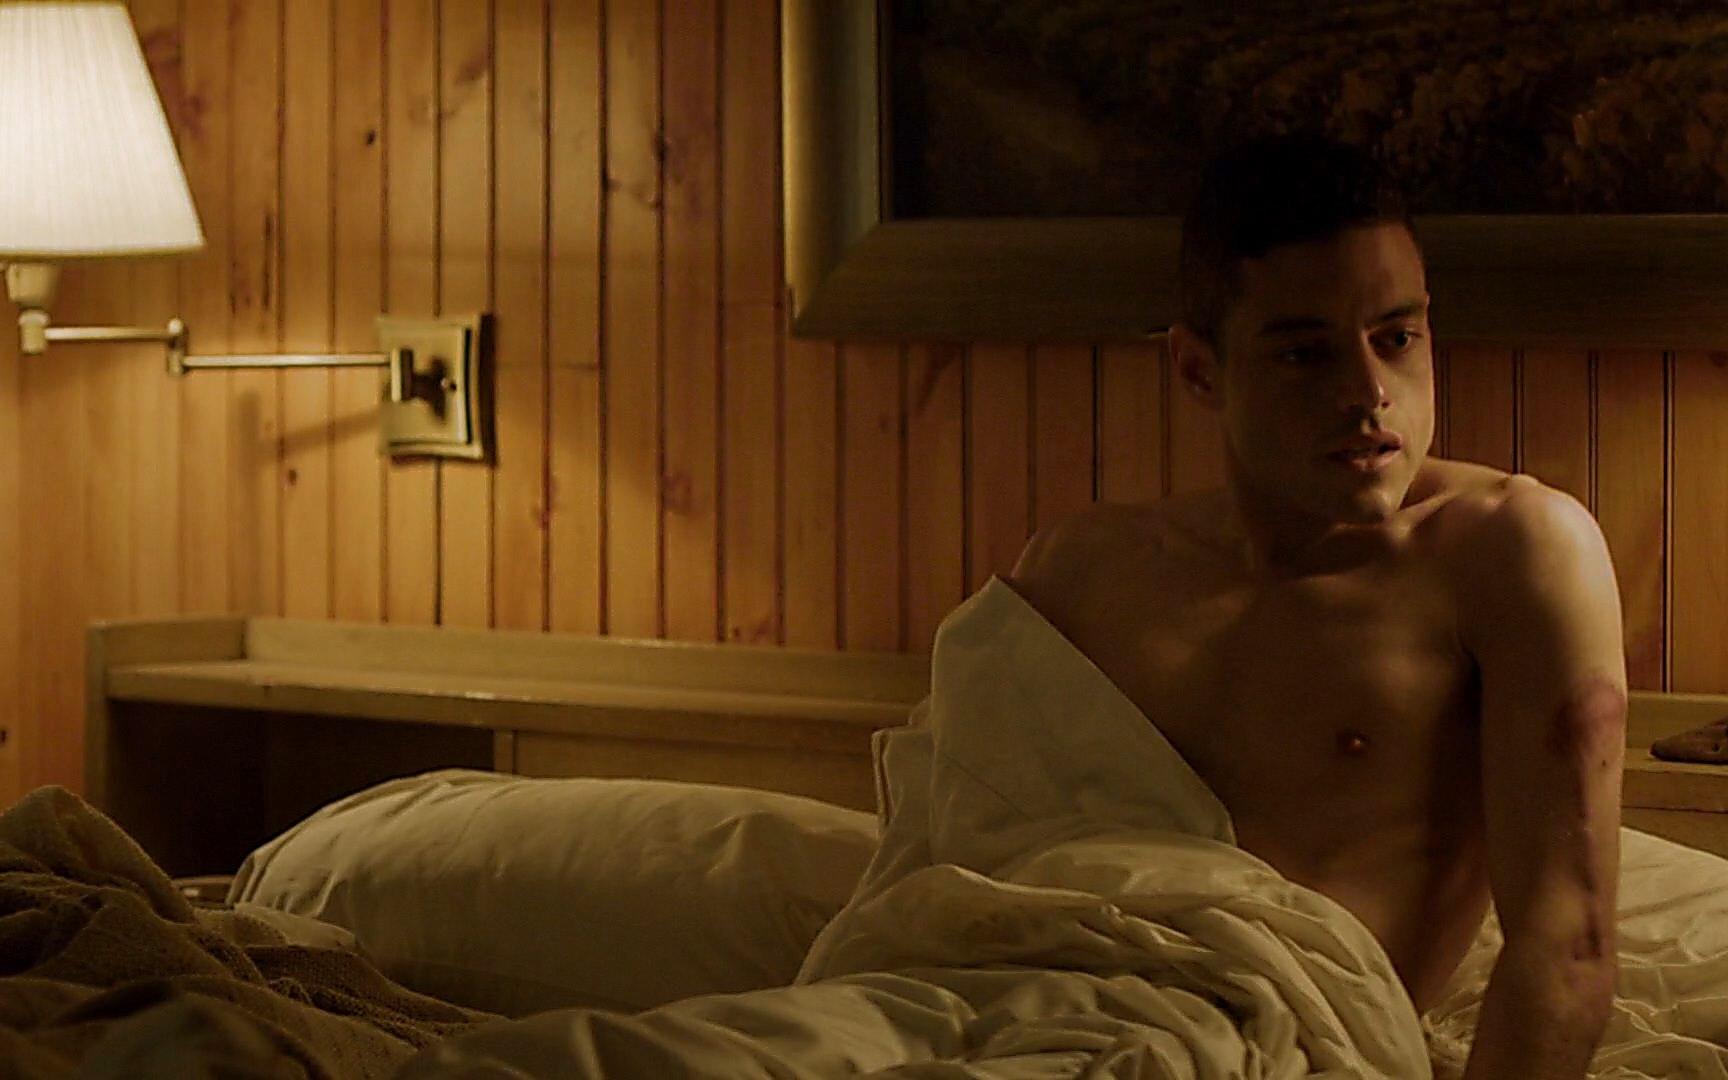 Rami Malek sexy shirtless scene July 18, 2015, 1pm